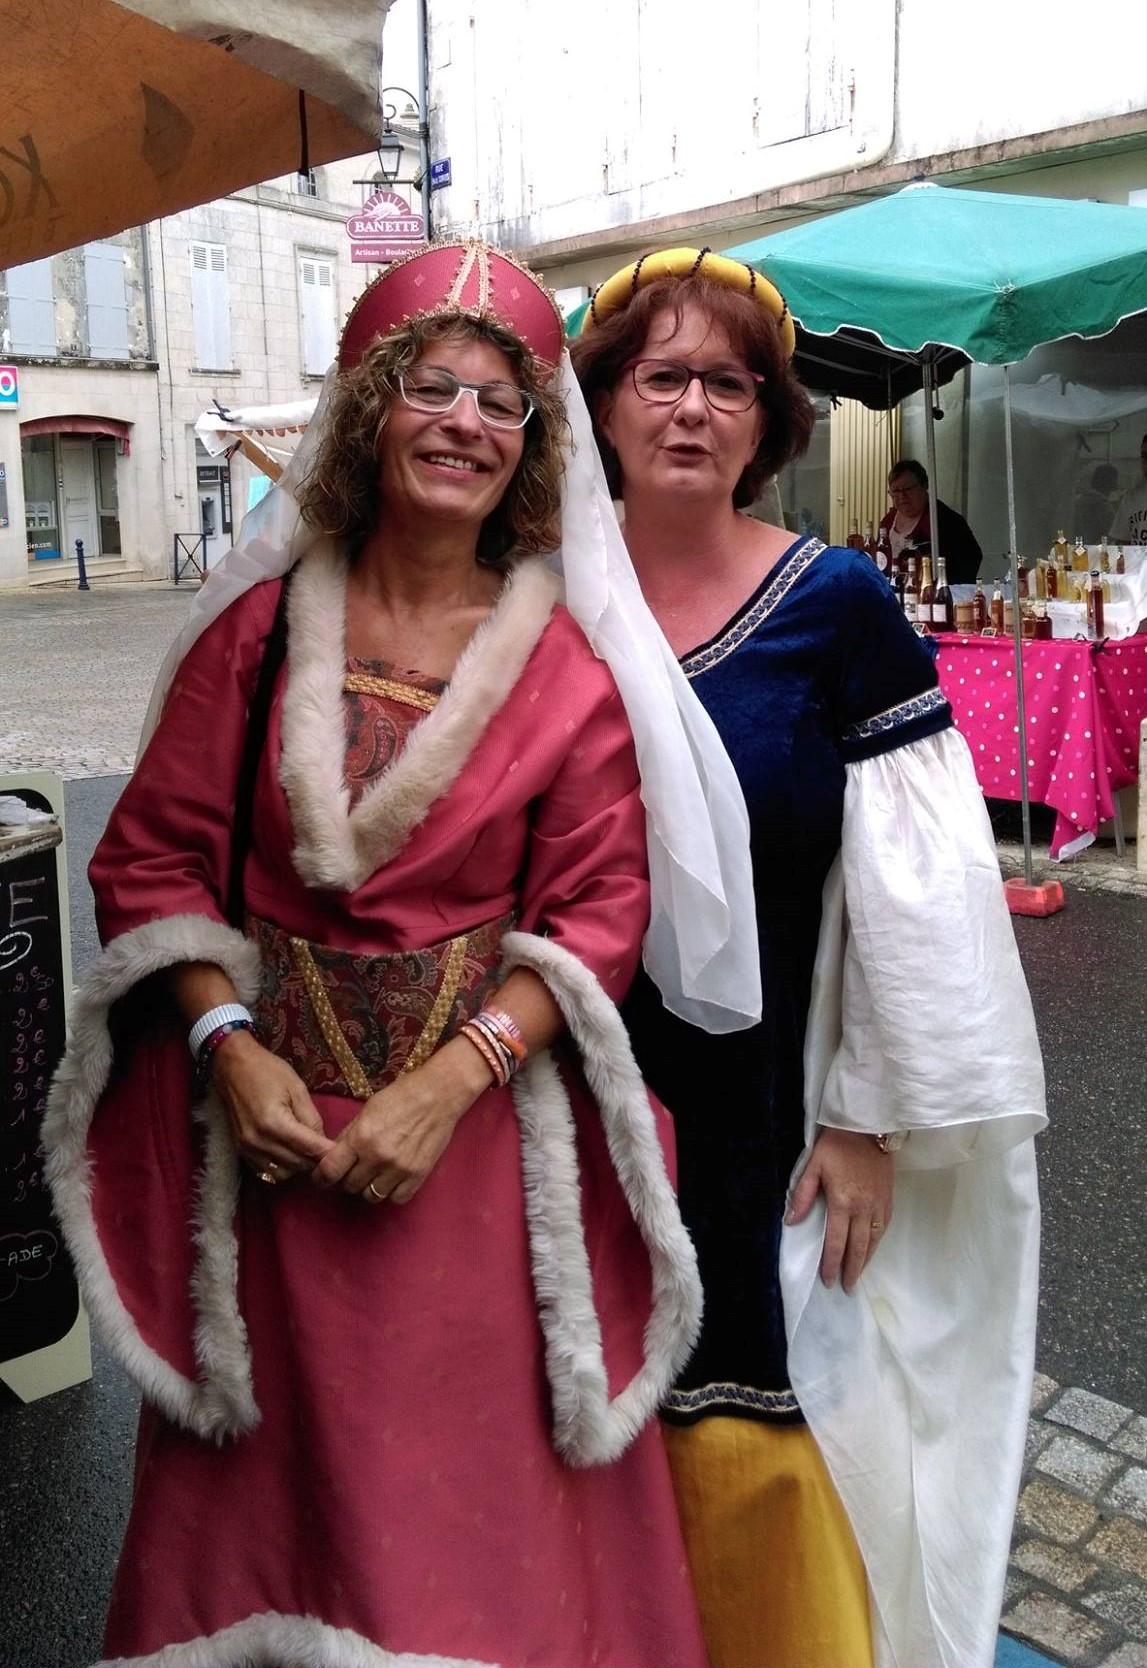 Fête Médiévale Pons 2017 - GICC (2)